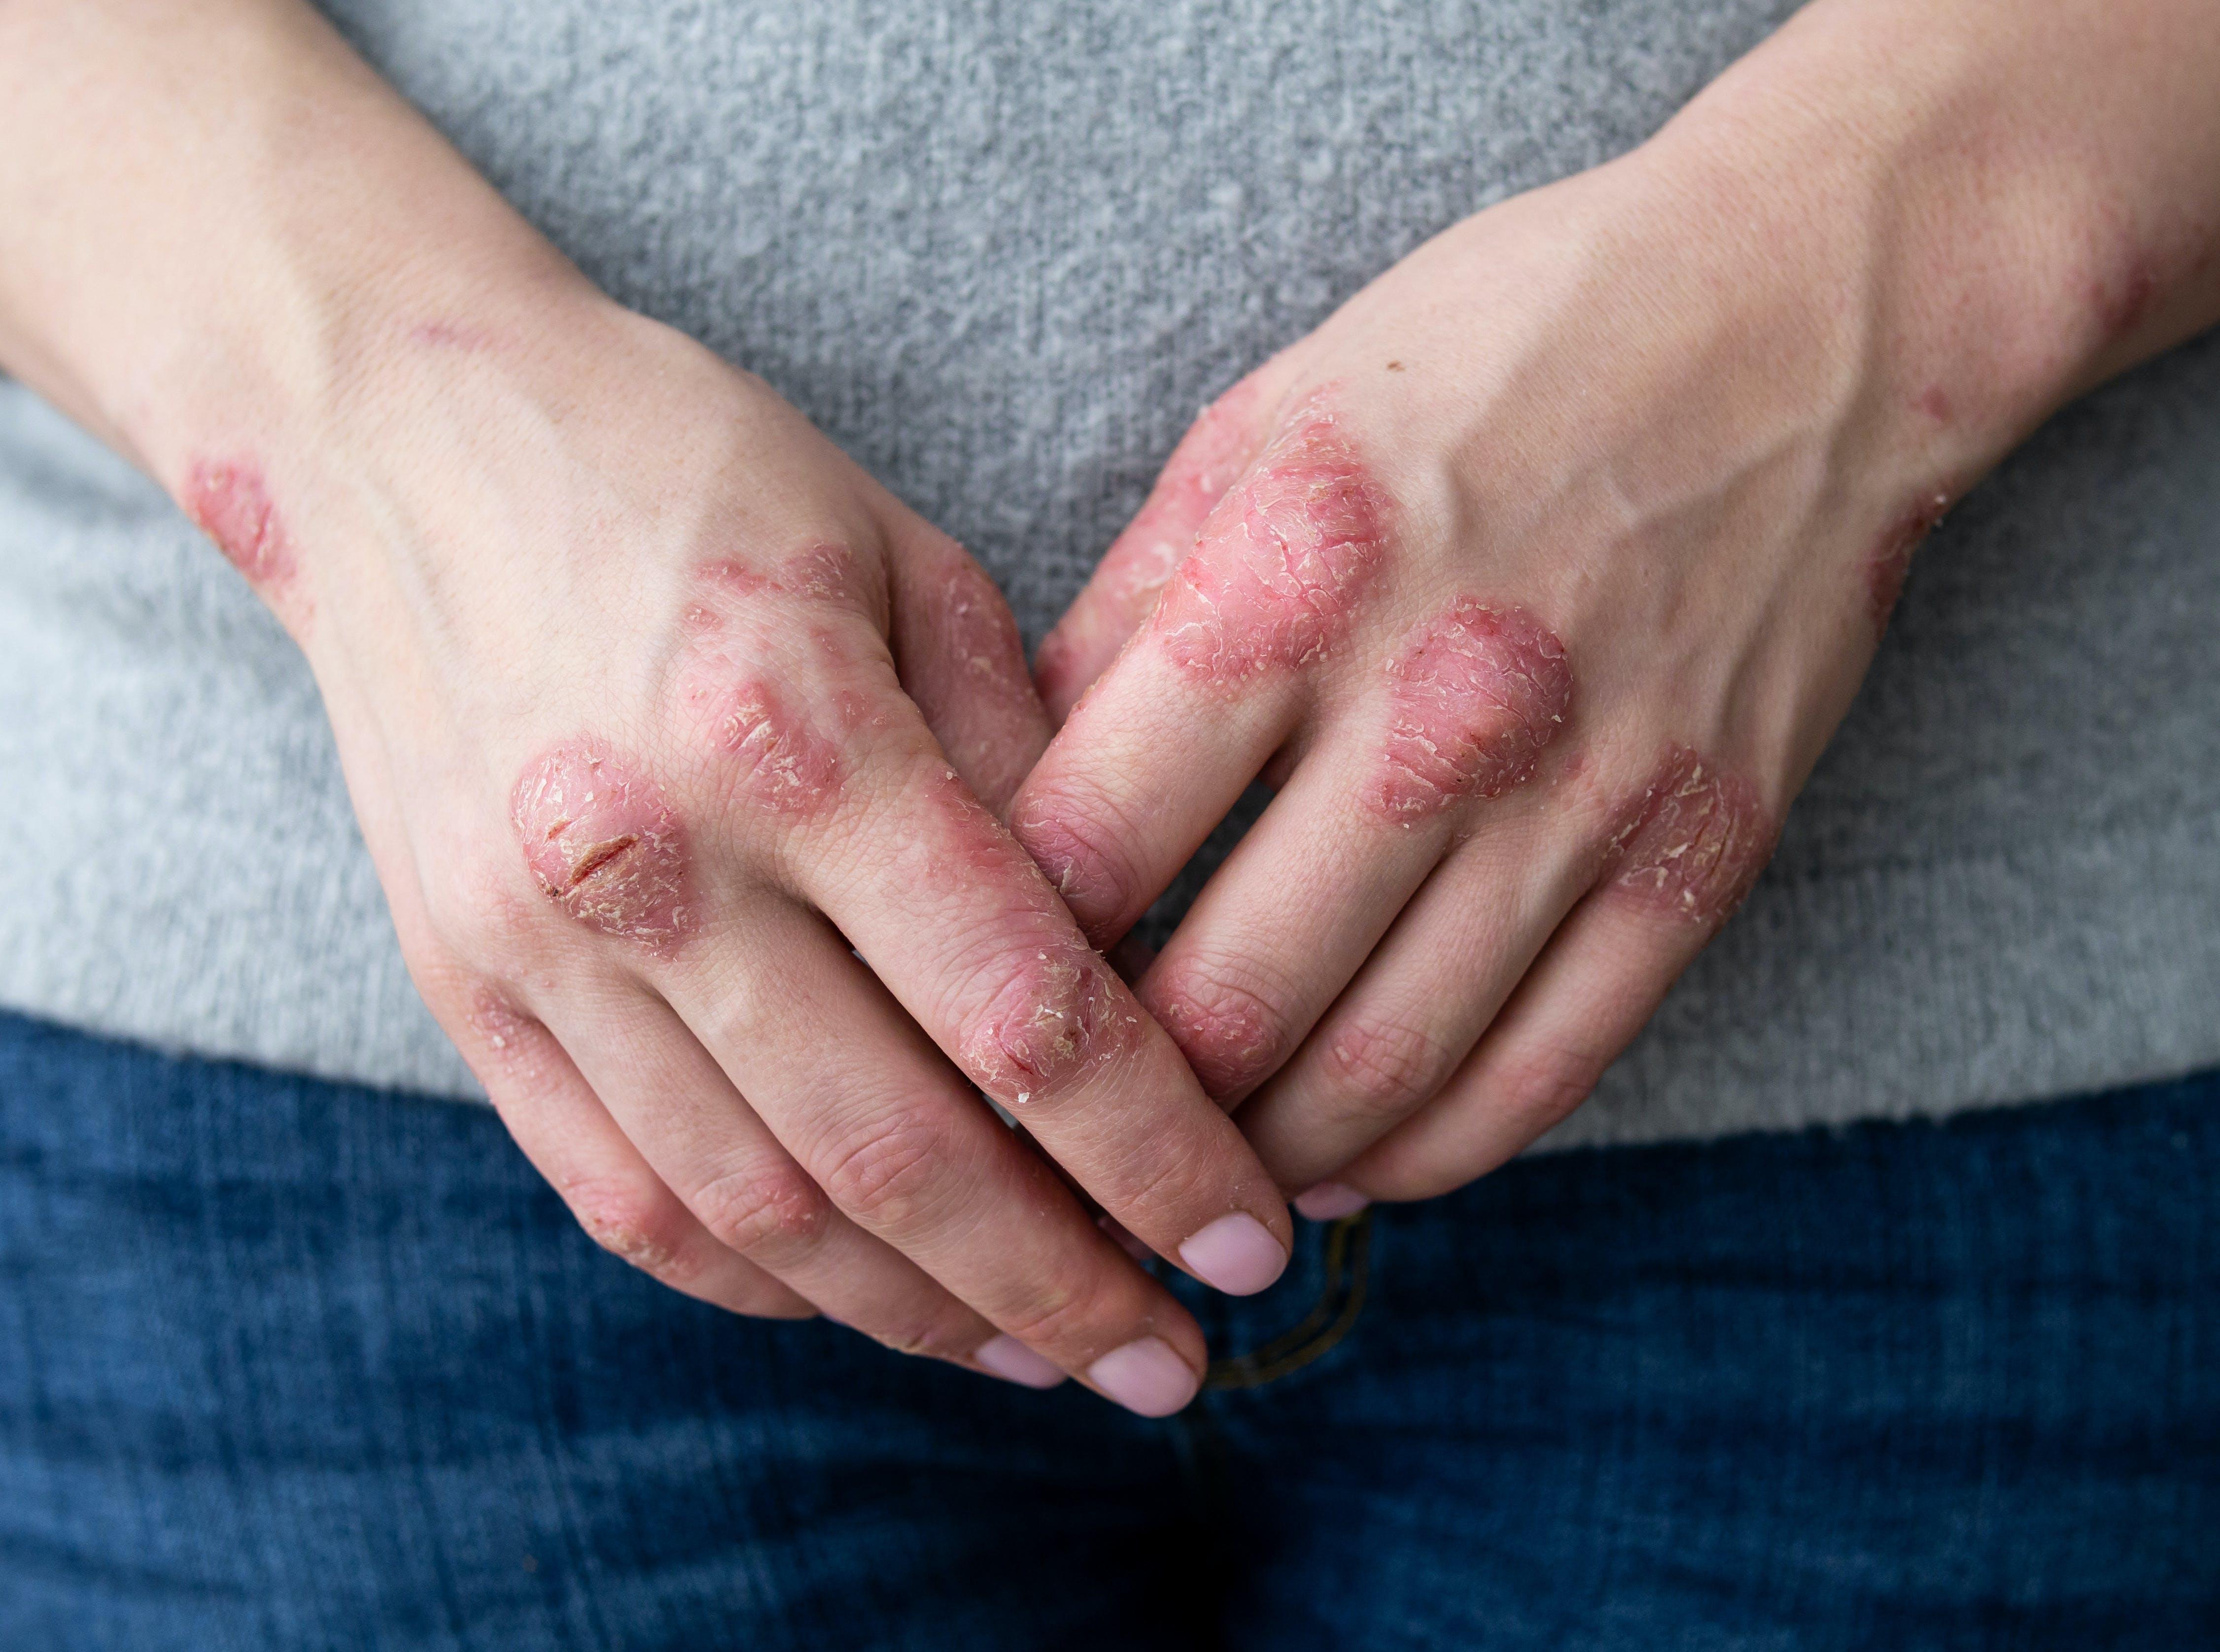 maladie peau pied